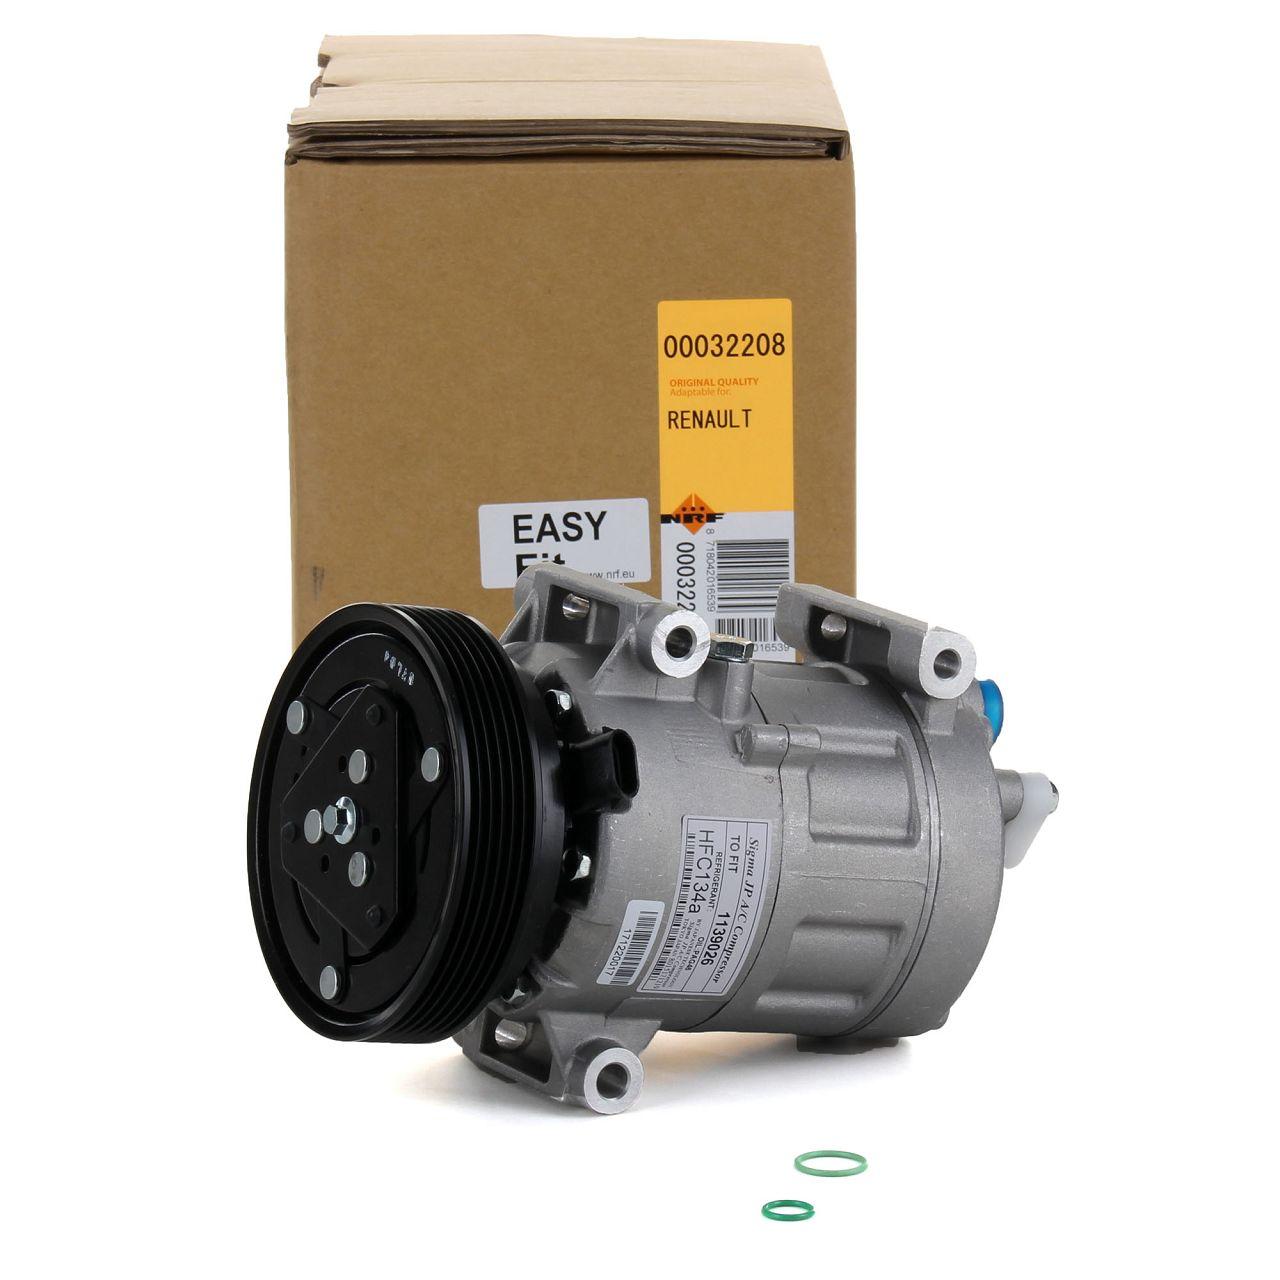 NRF 32208 Kompressor Klimaanlage EASY FIT für NISSAN QASHQAI RENAULT MEGANE